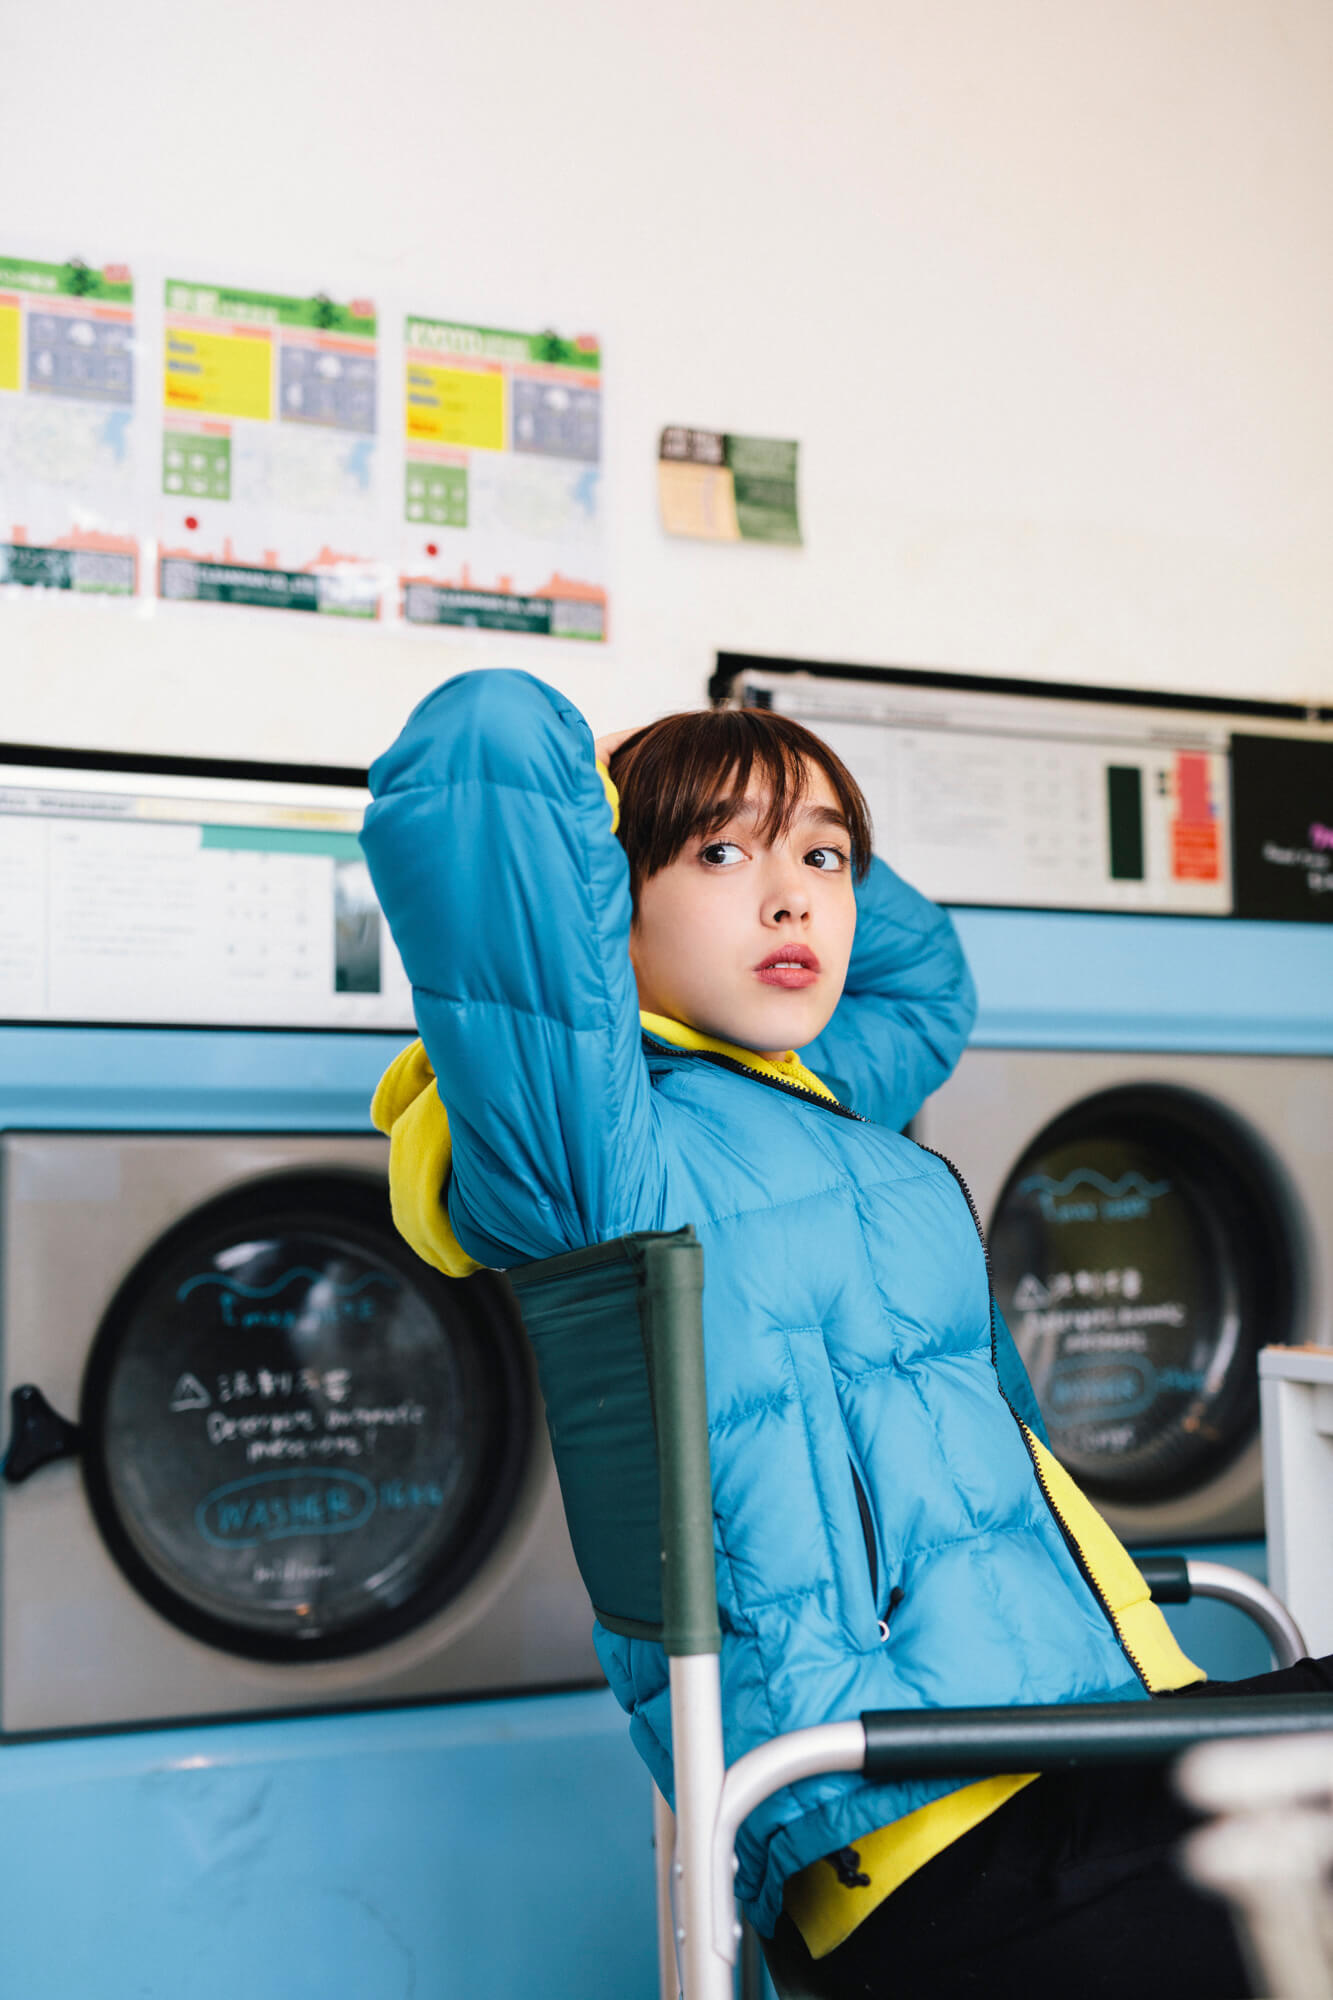 %e4%ba%ac%e9%83%bd-kyoto-laundry-%e3%83%a9%e3%83%b3%e3%83%88%e3%82%99%e3%83%aa%e3%83%bc%e3%80%80aeon-%e3%82%a4%e3%82%aa%e3%83%b3%e3%80%80%e6%9f%94%e8%bb%9f%e5%89%a4%e3%80%80%e6%b4%97%e5%89%a4%e3%80-7